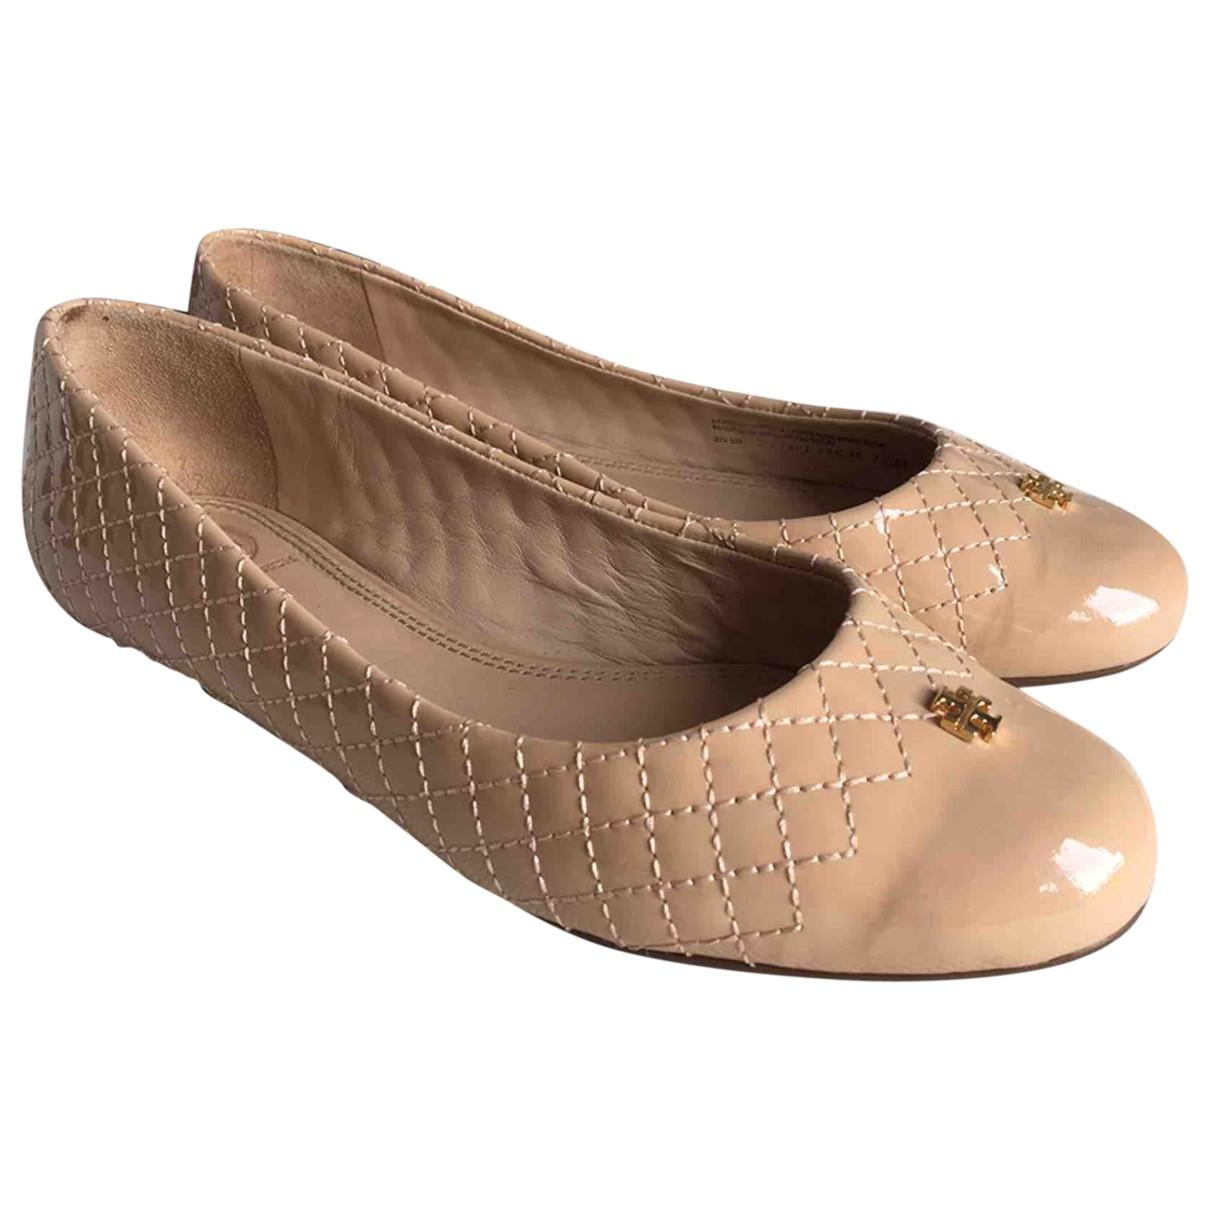 Tory Burch \N Beige Patent leather Ballet flats for Women 38 EU